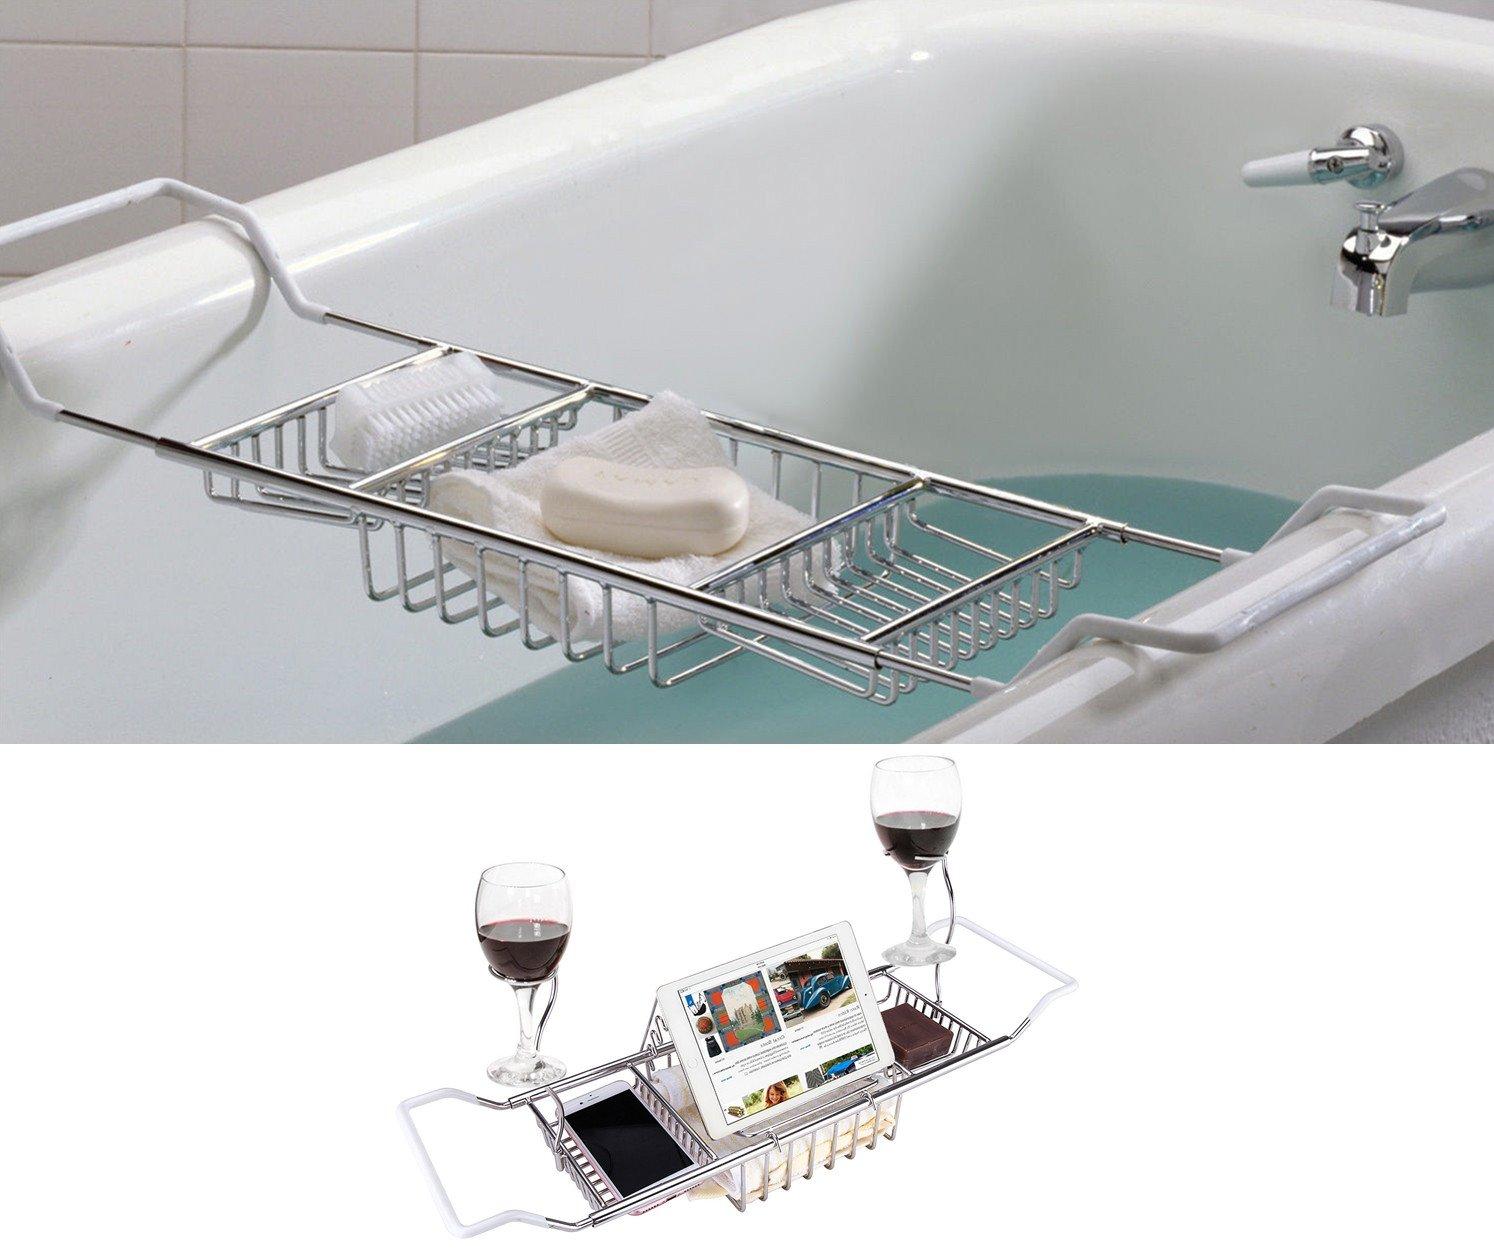 ipegtop Stainless Steel Bathtub Caddy Tray Over Bath Tub Racks ...